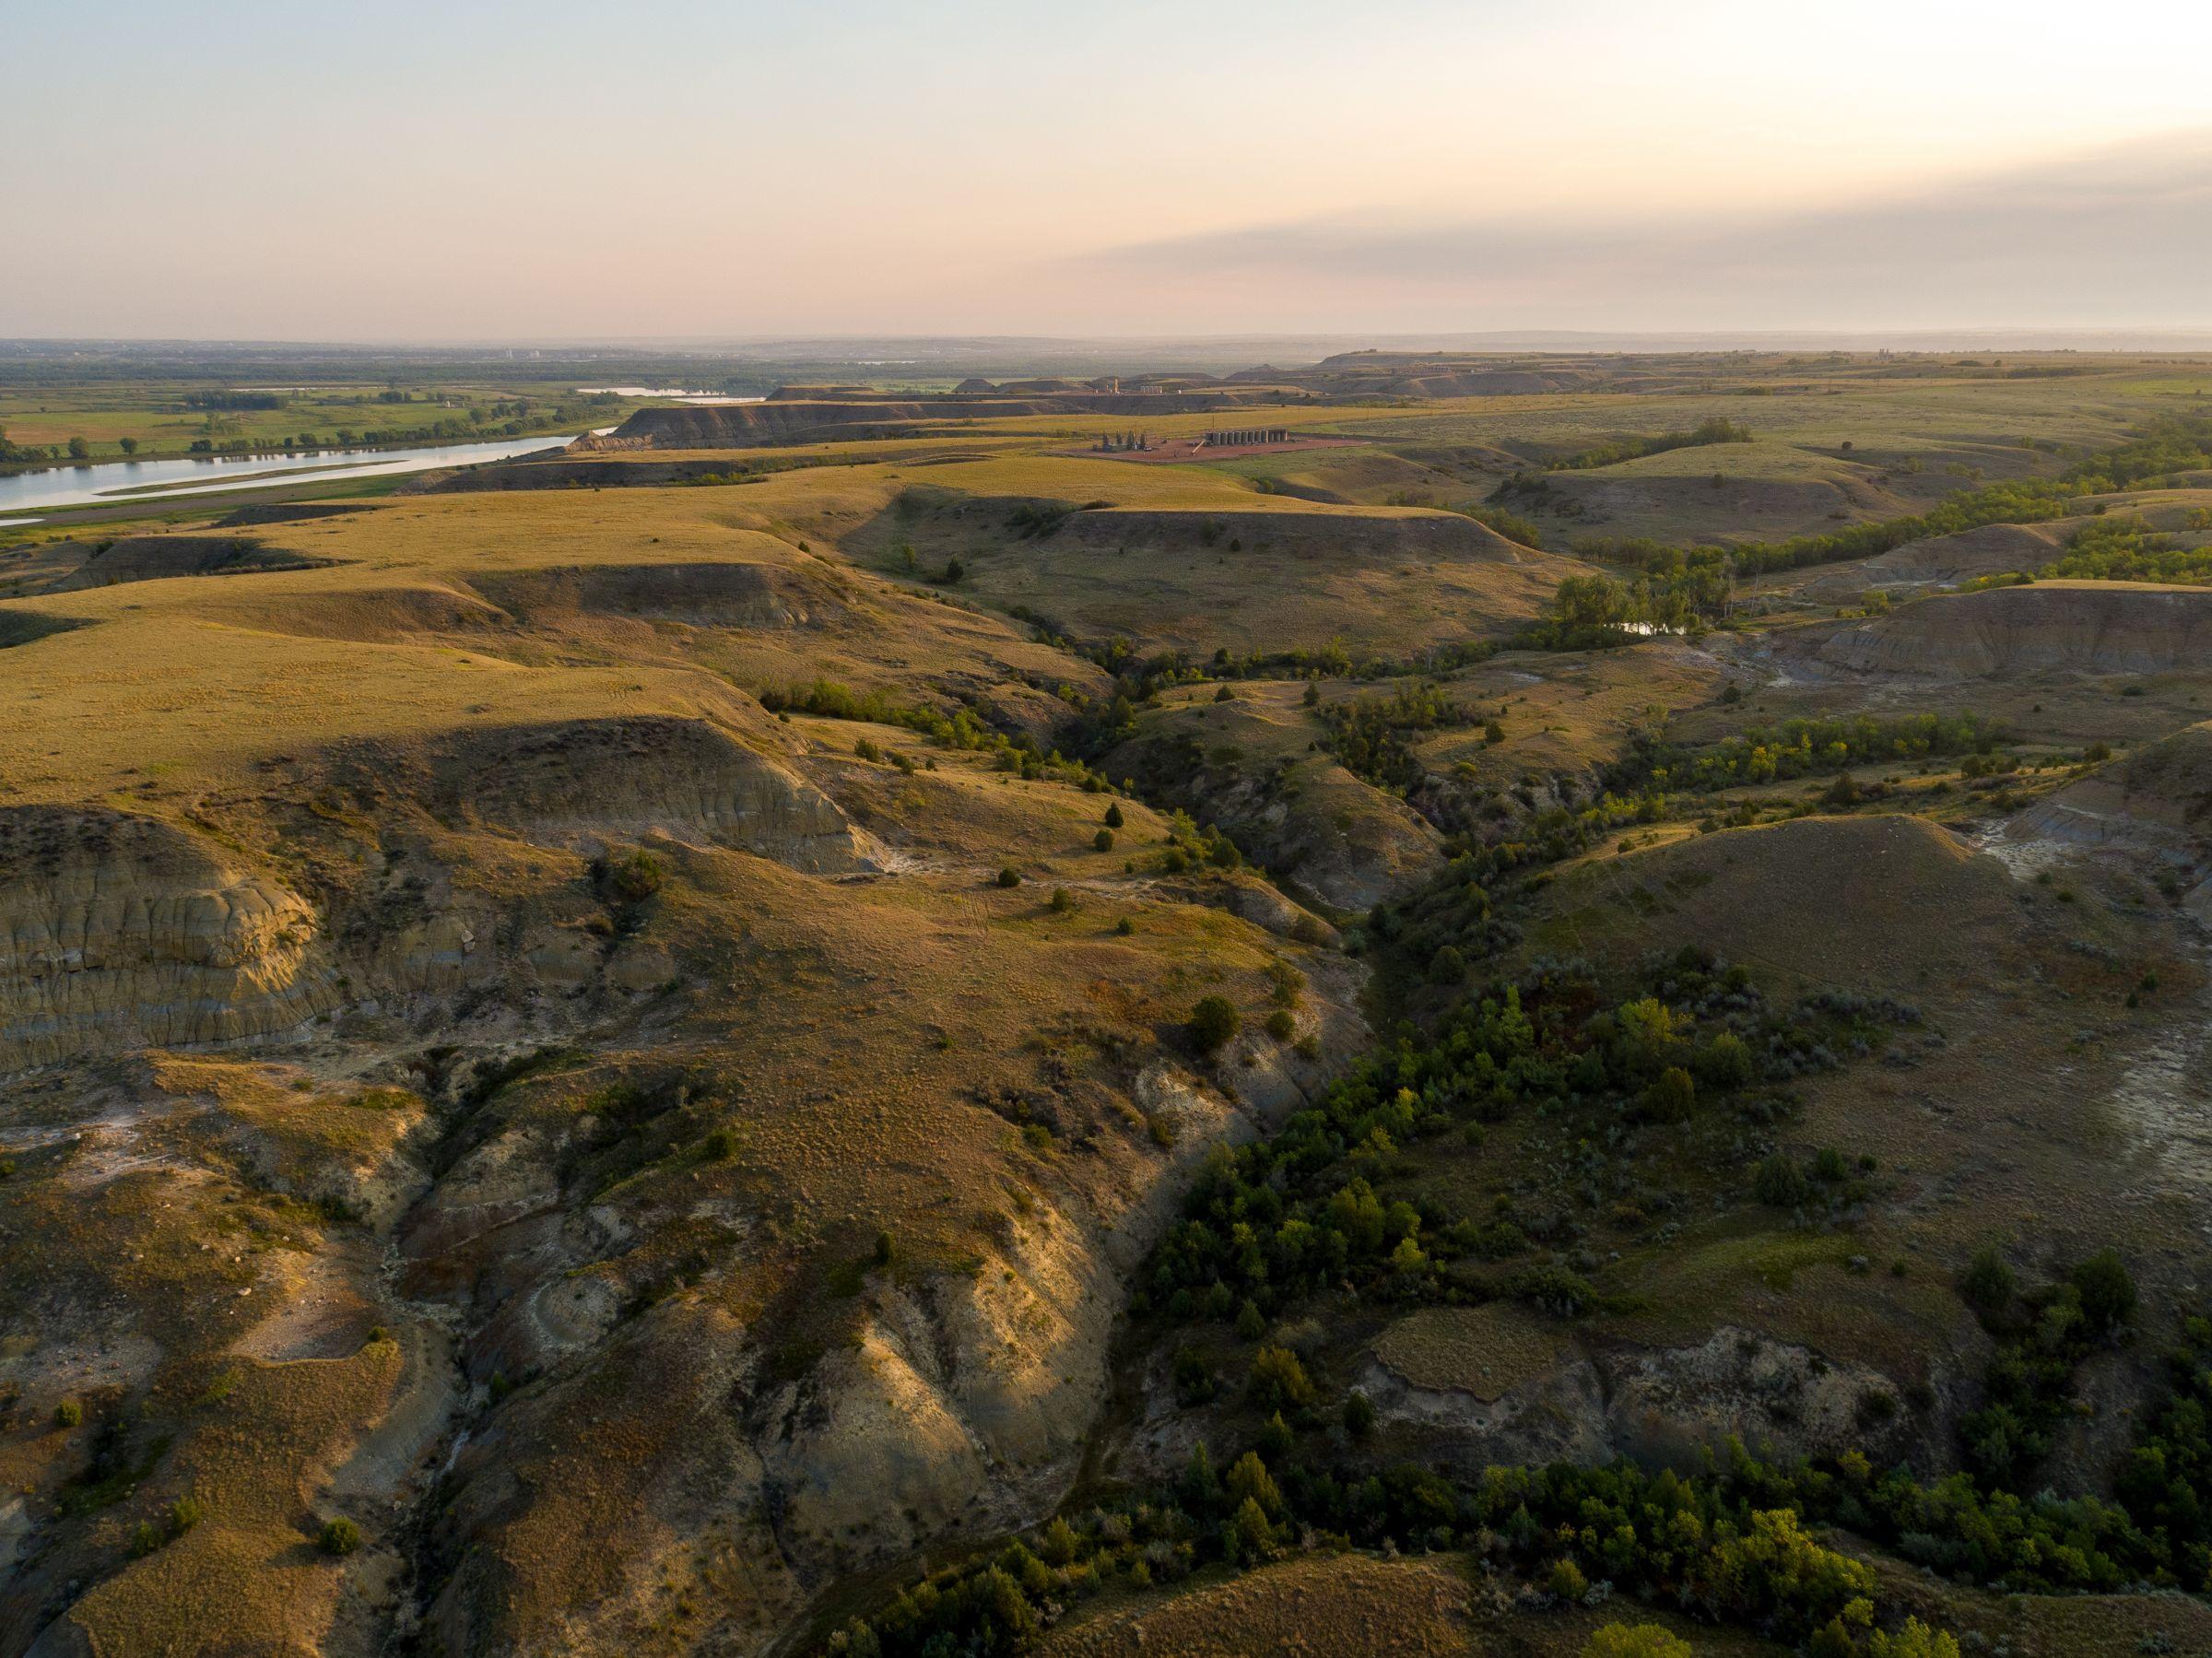 auctions-land-mckenzie-county-north-dakota-270-acres-listing-number-15735-1-2021-09-10-124713.jpeg